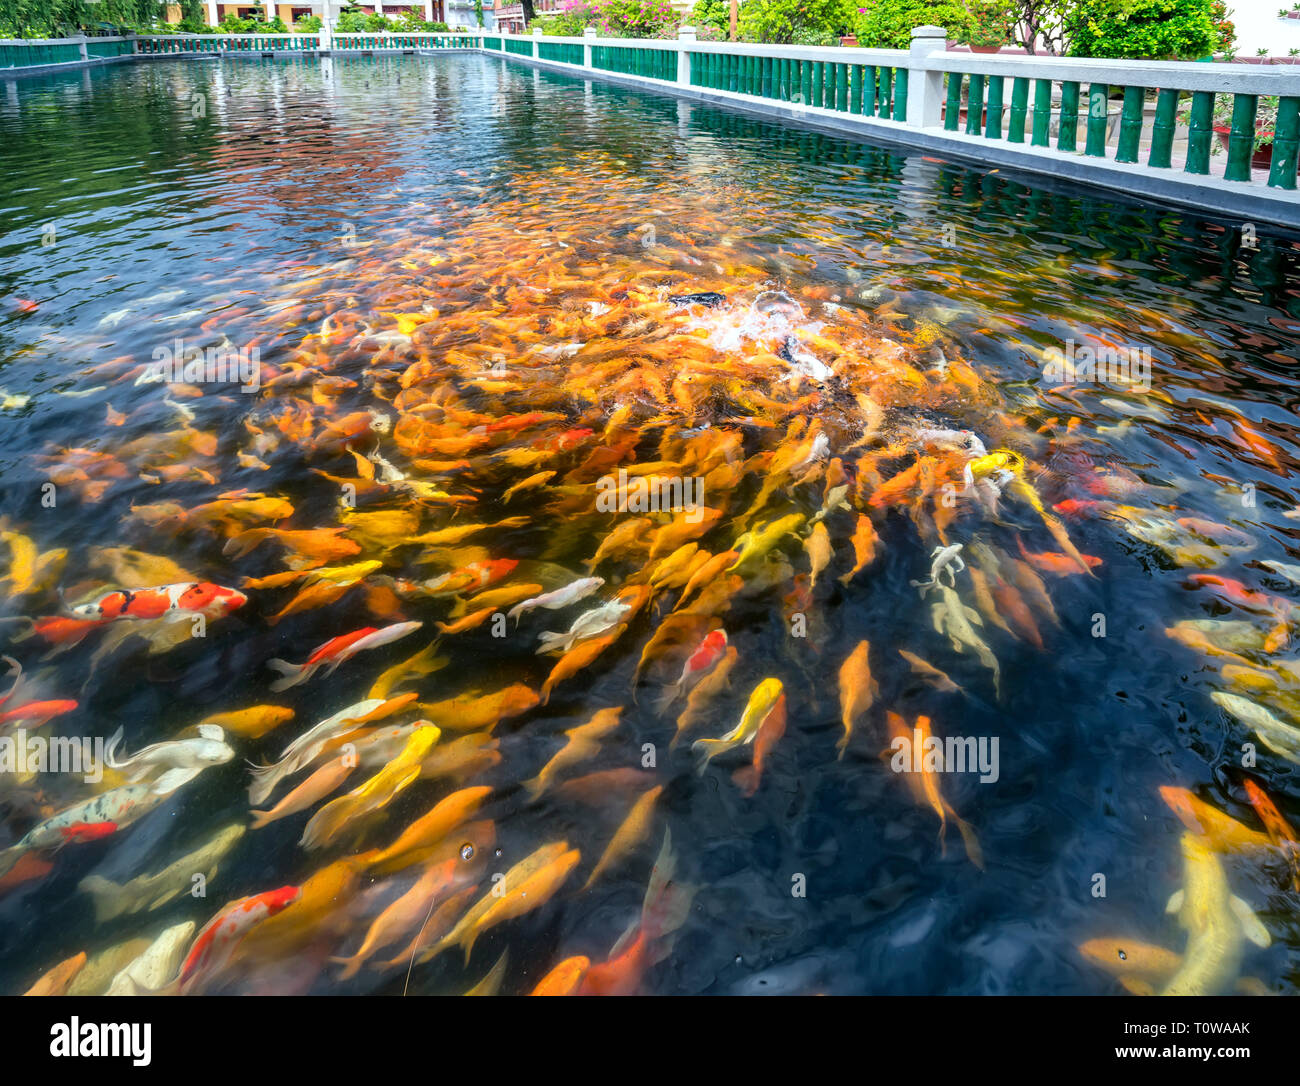 Colorful koi carp or fancy carp fish group in pond. - Stock Image